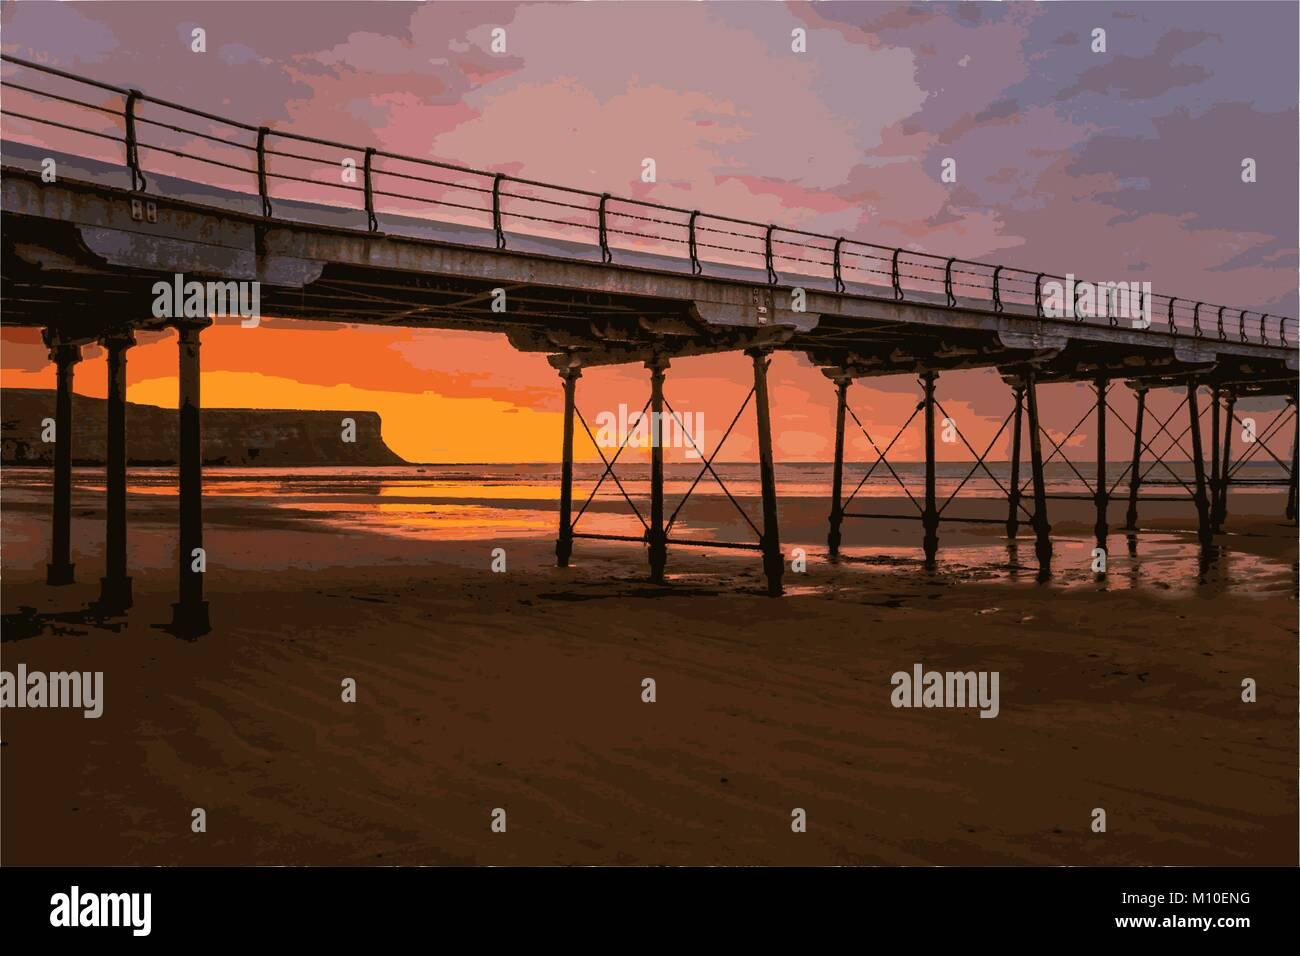 Bridge over beach with sunset - Stock Vector